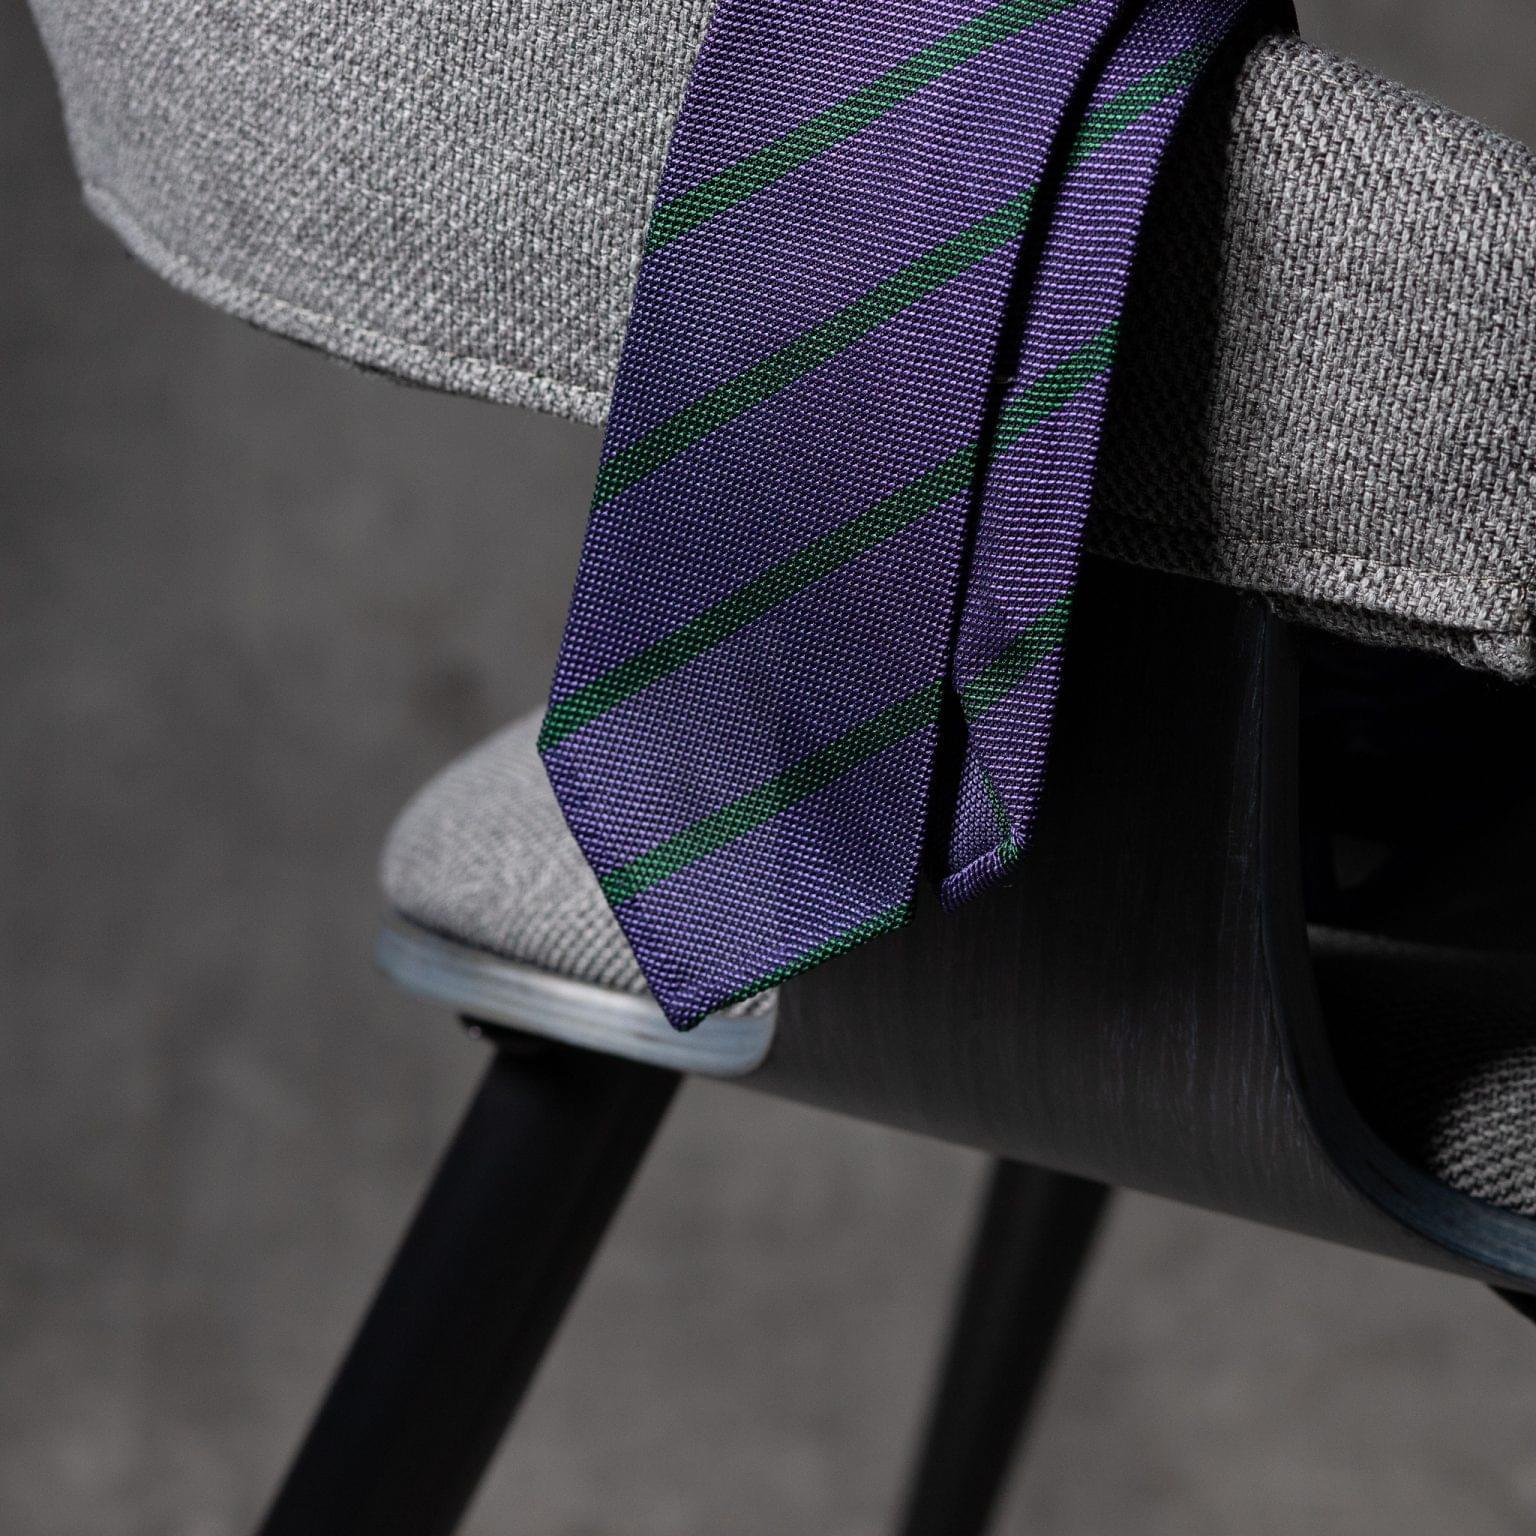 GRENADINE-0531-Tie-Initials-Corbata-Iniciales-The-Seelk-2